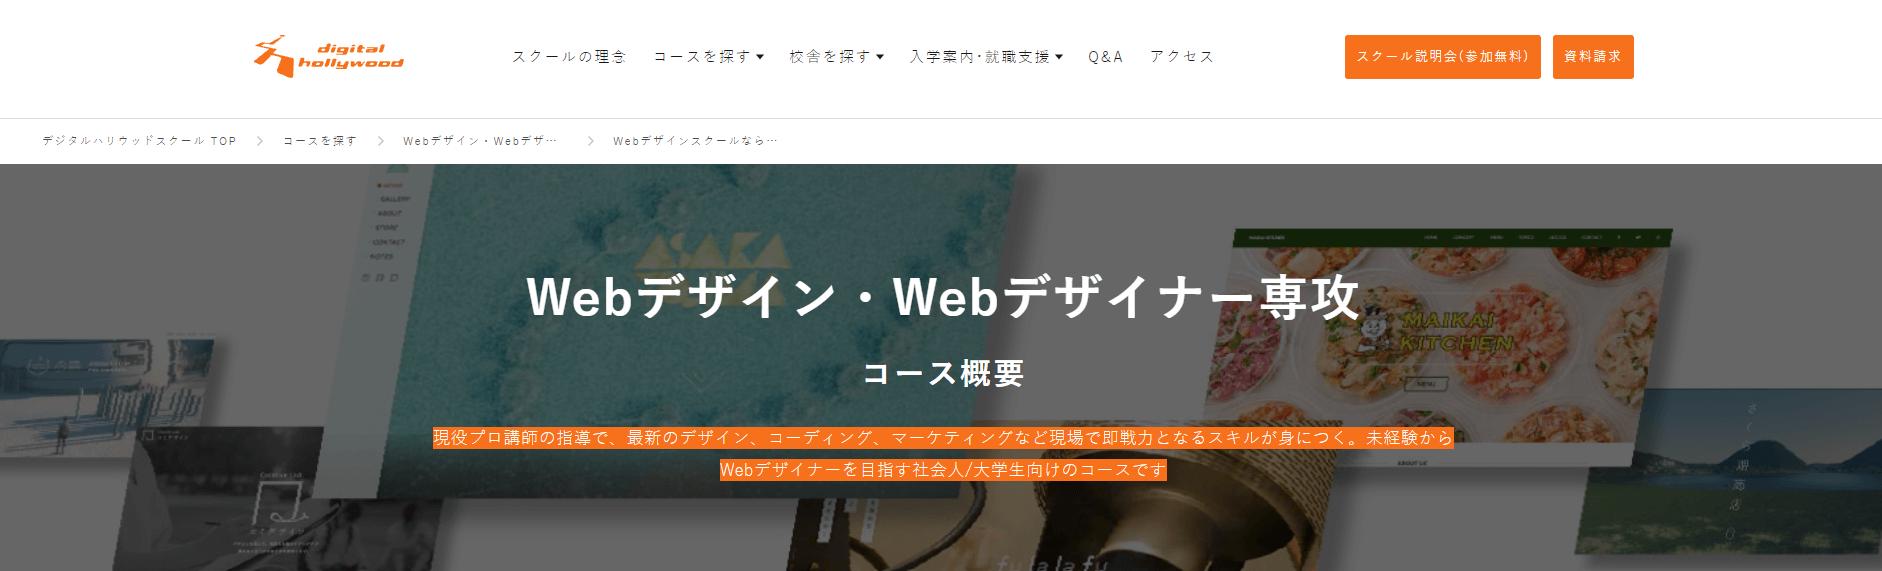 webデザイン_スクール_転職サポートが強い_デジタルハリウッドstudio